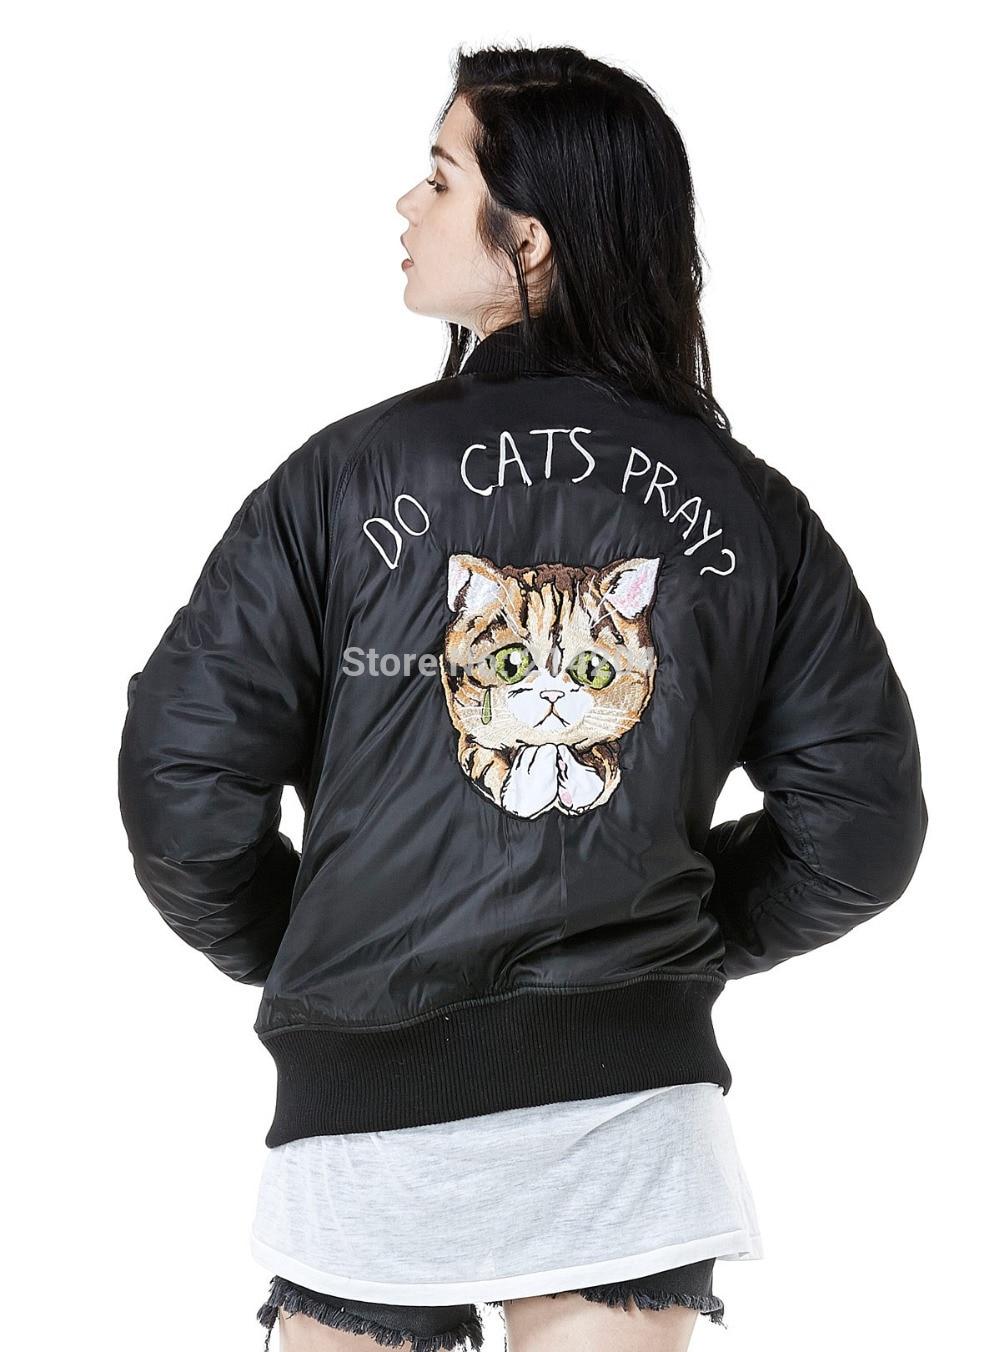 Aliexpress.com : Buy Women Bomber Parkas Jacket Harajuku Unif CATS